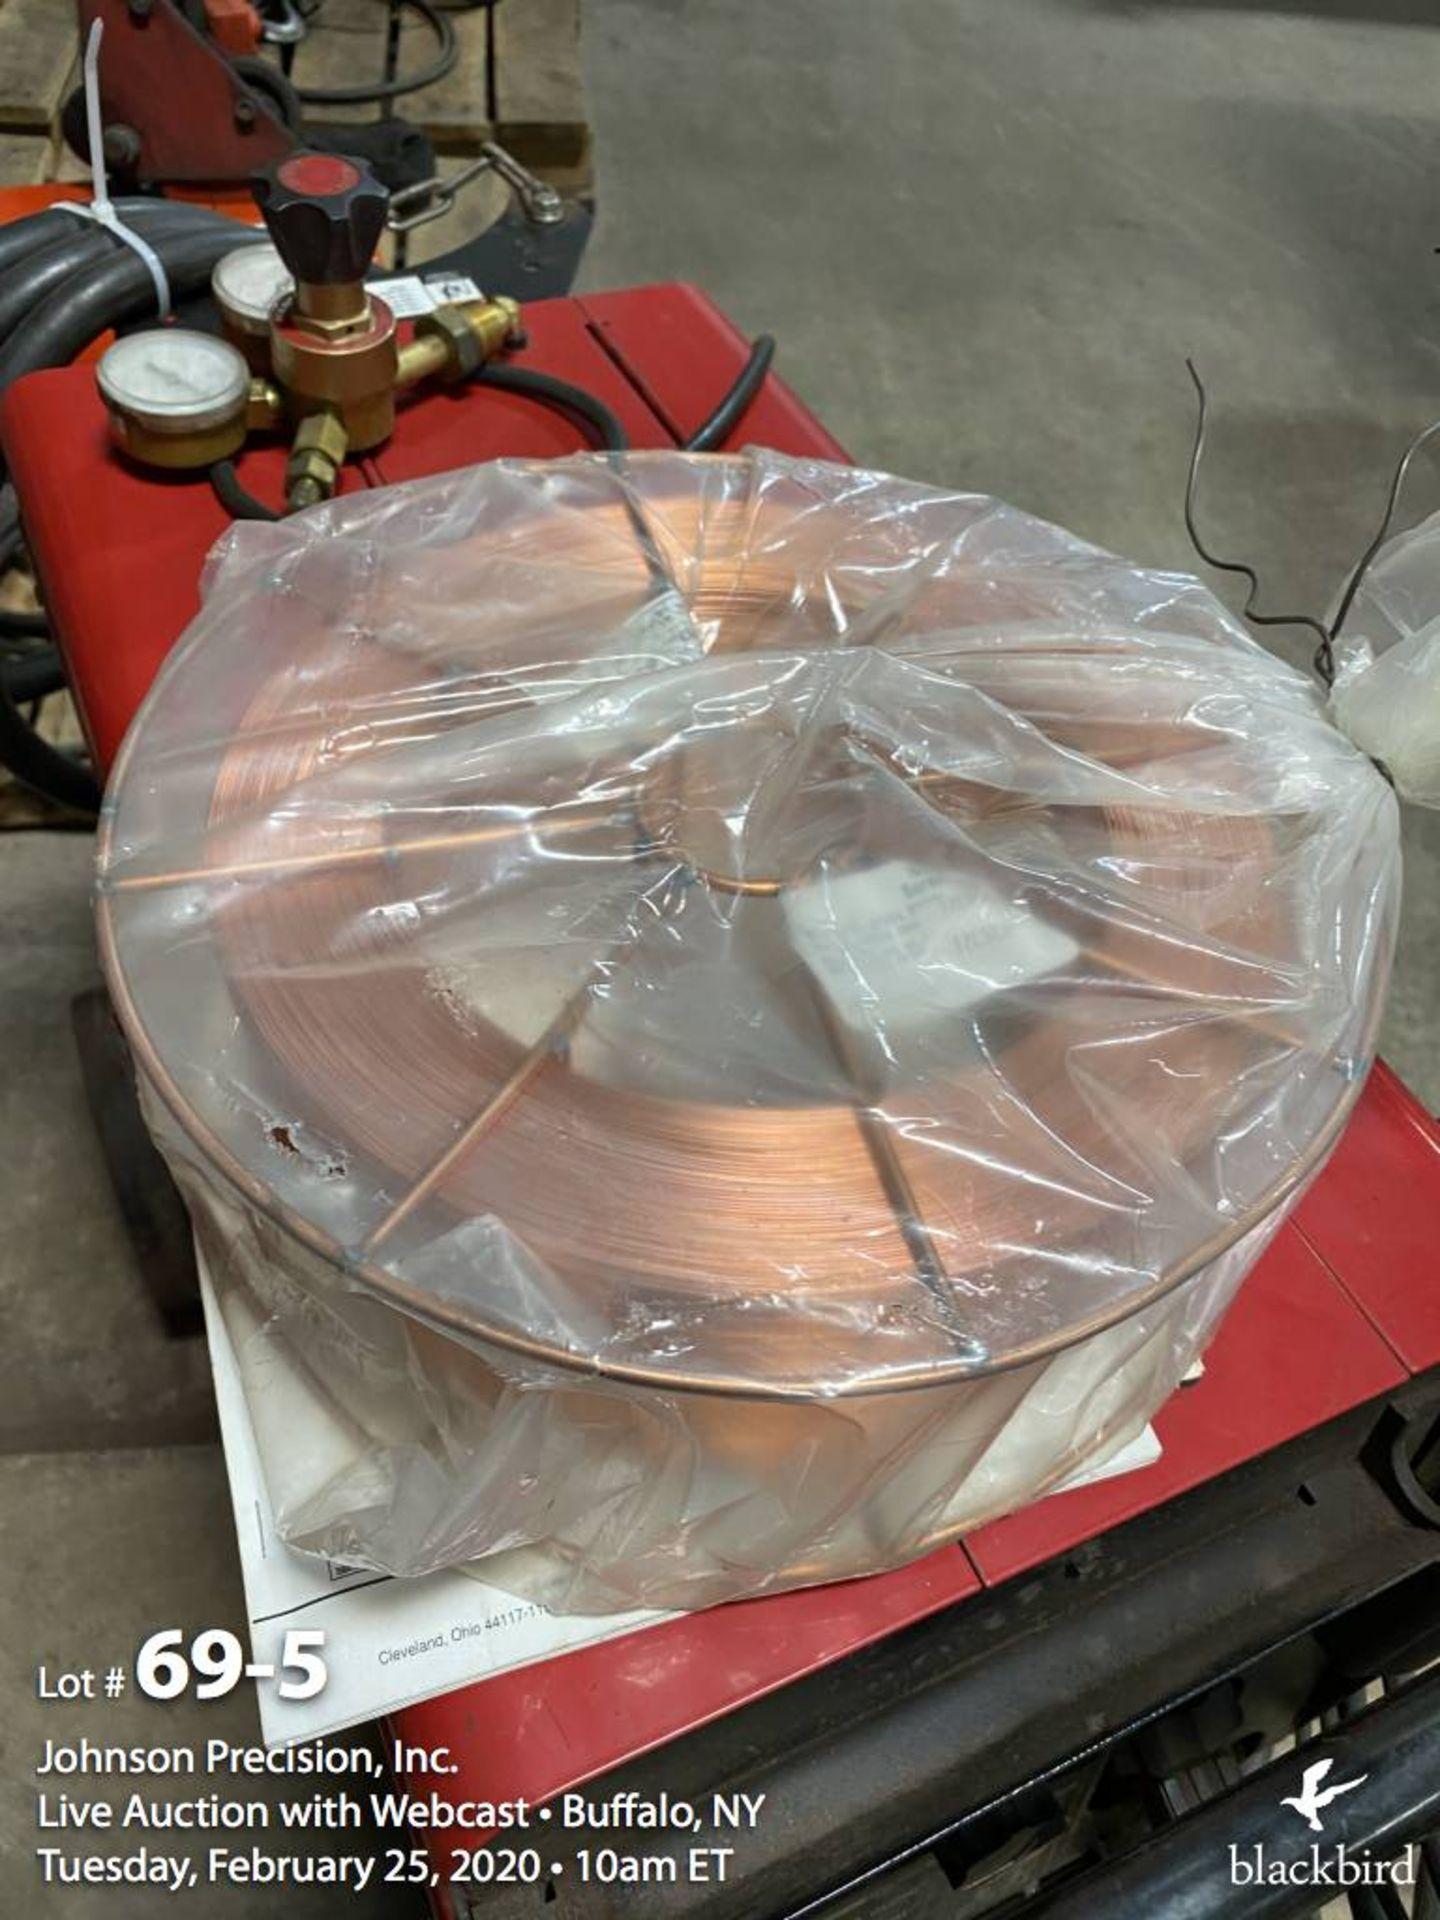 Lot 69 - Lincoln power MIG 300 welder